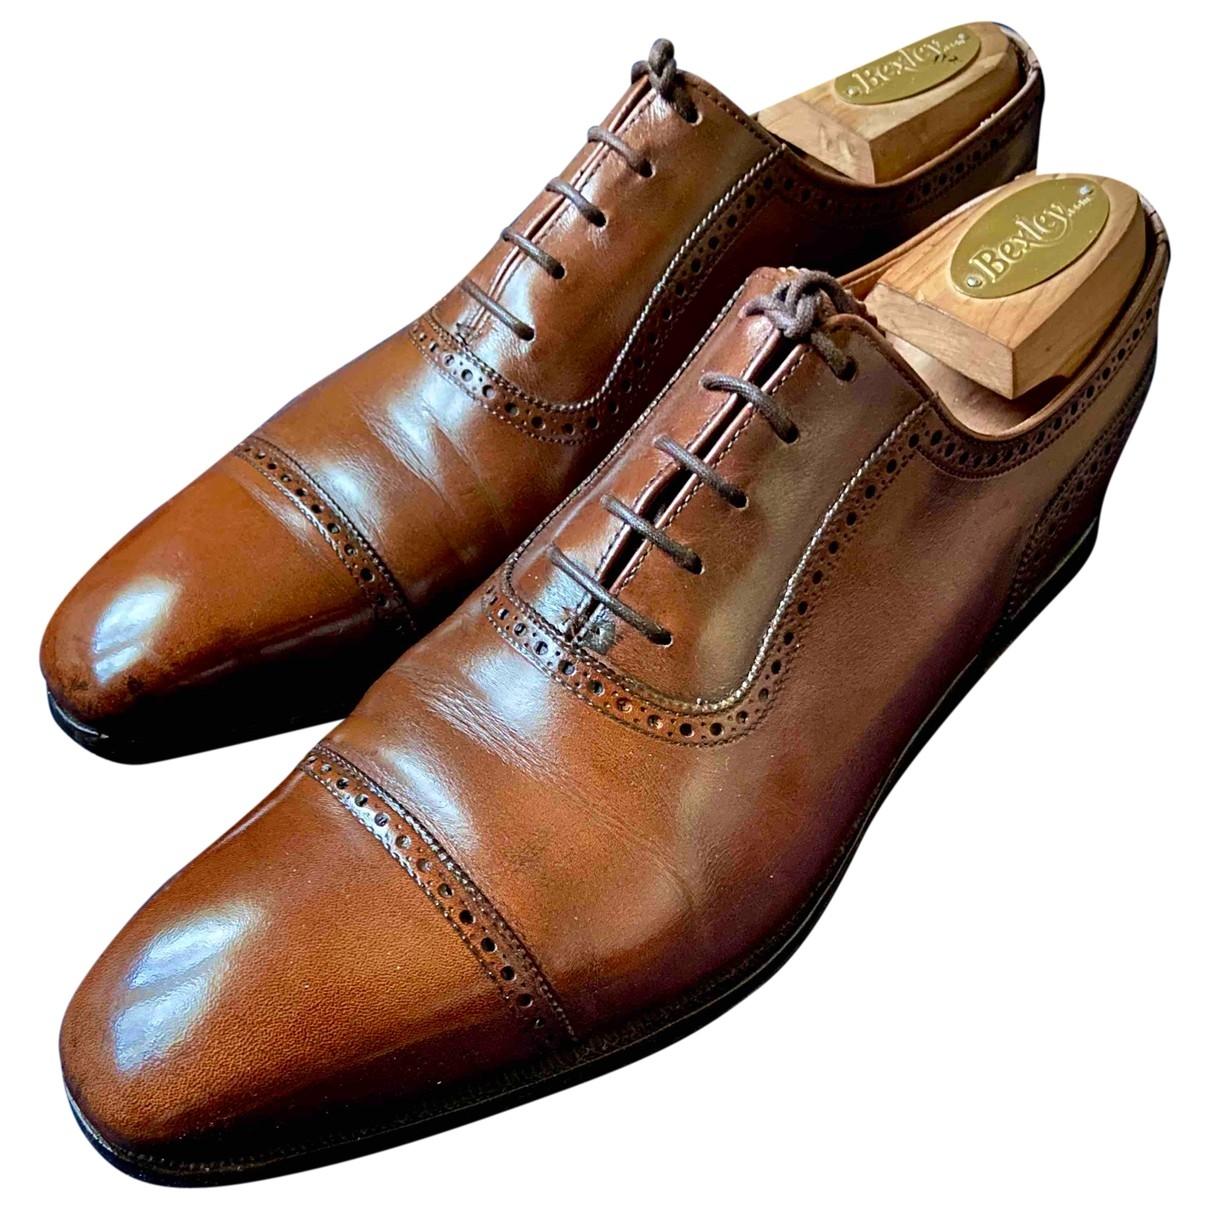 Crockett& Jones - Derbies   pour homme en cuir - marron